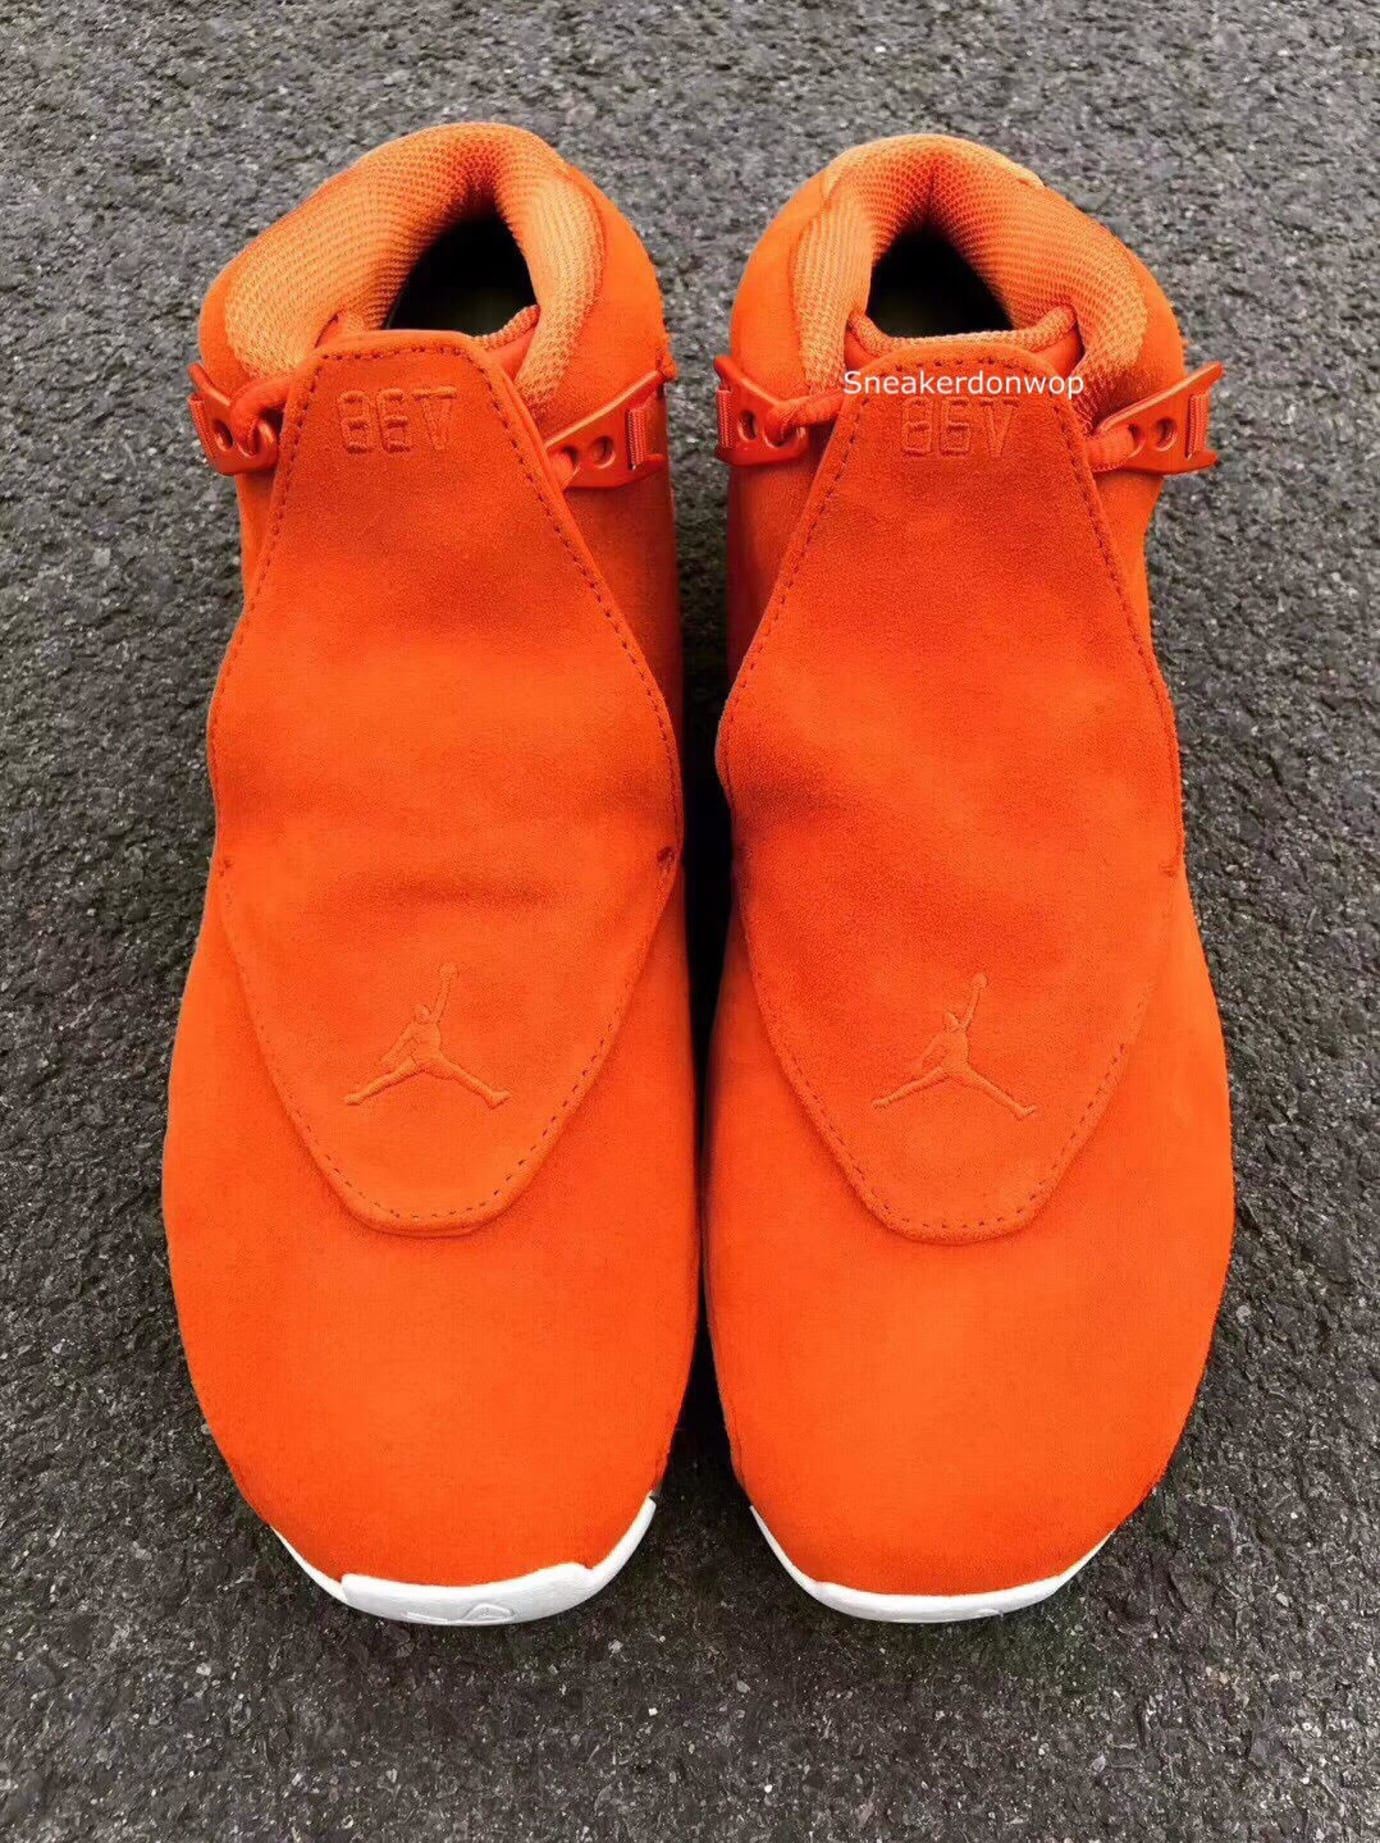 Air Jordan 18 Orange Release Date Front d1ef576dc